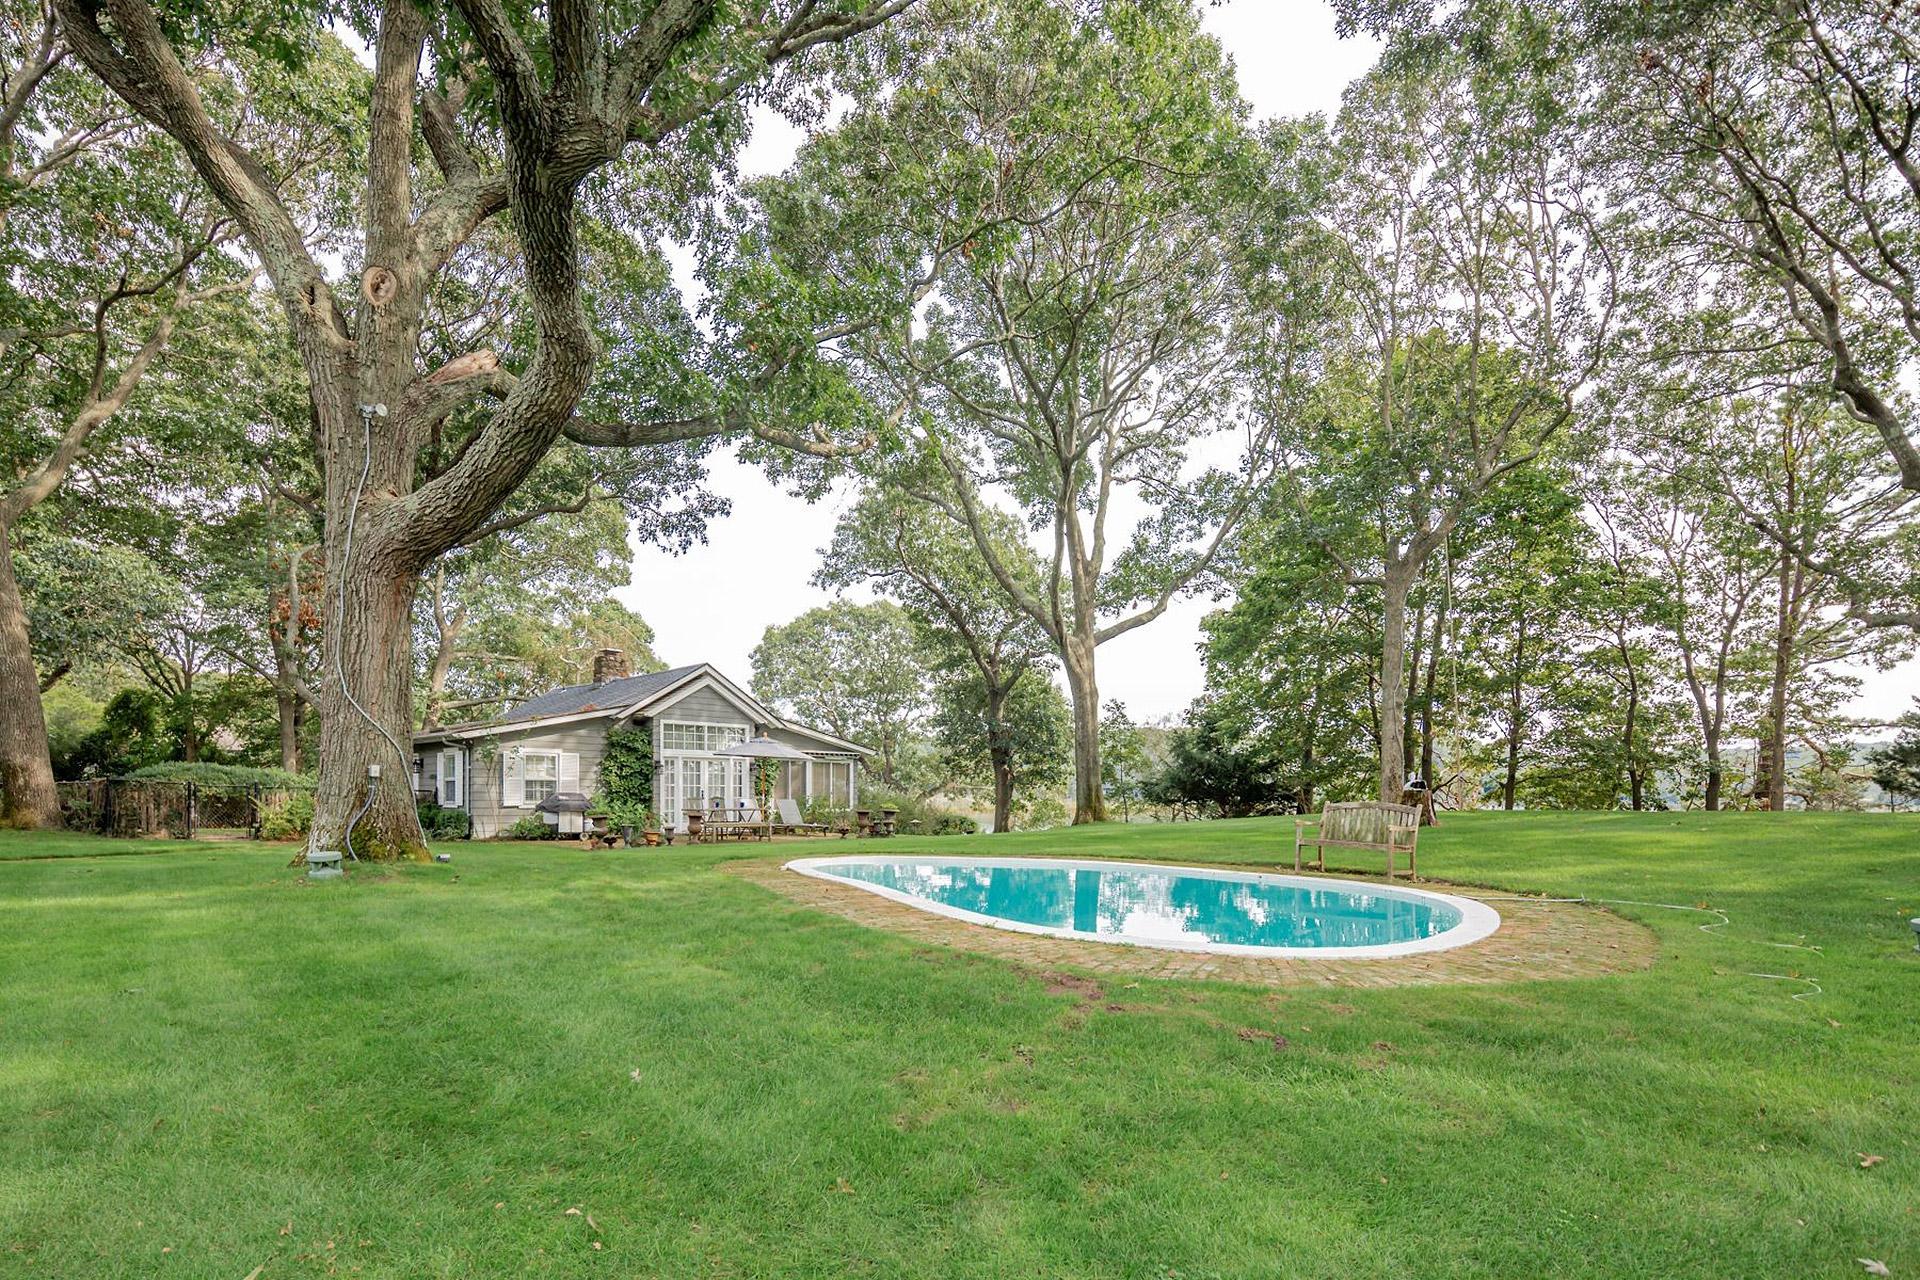 John Steinbeck's Sag Harbor Sanctuary